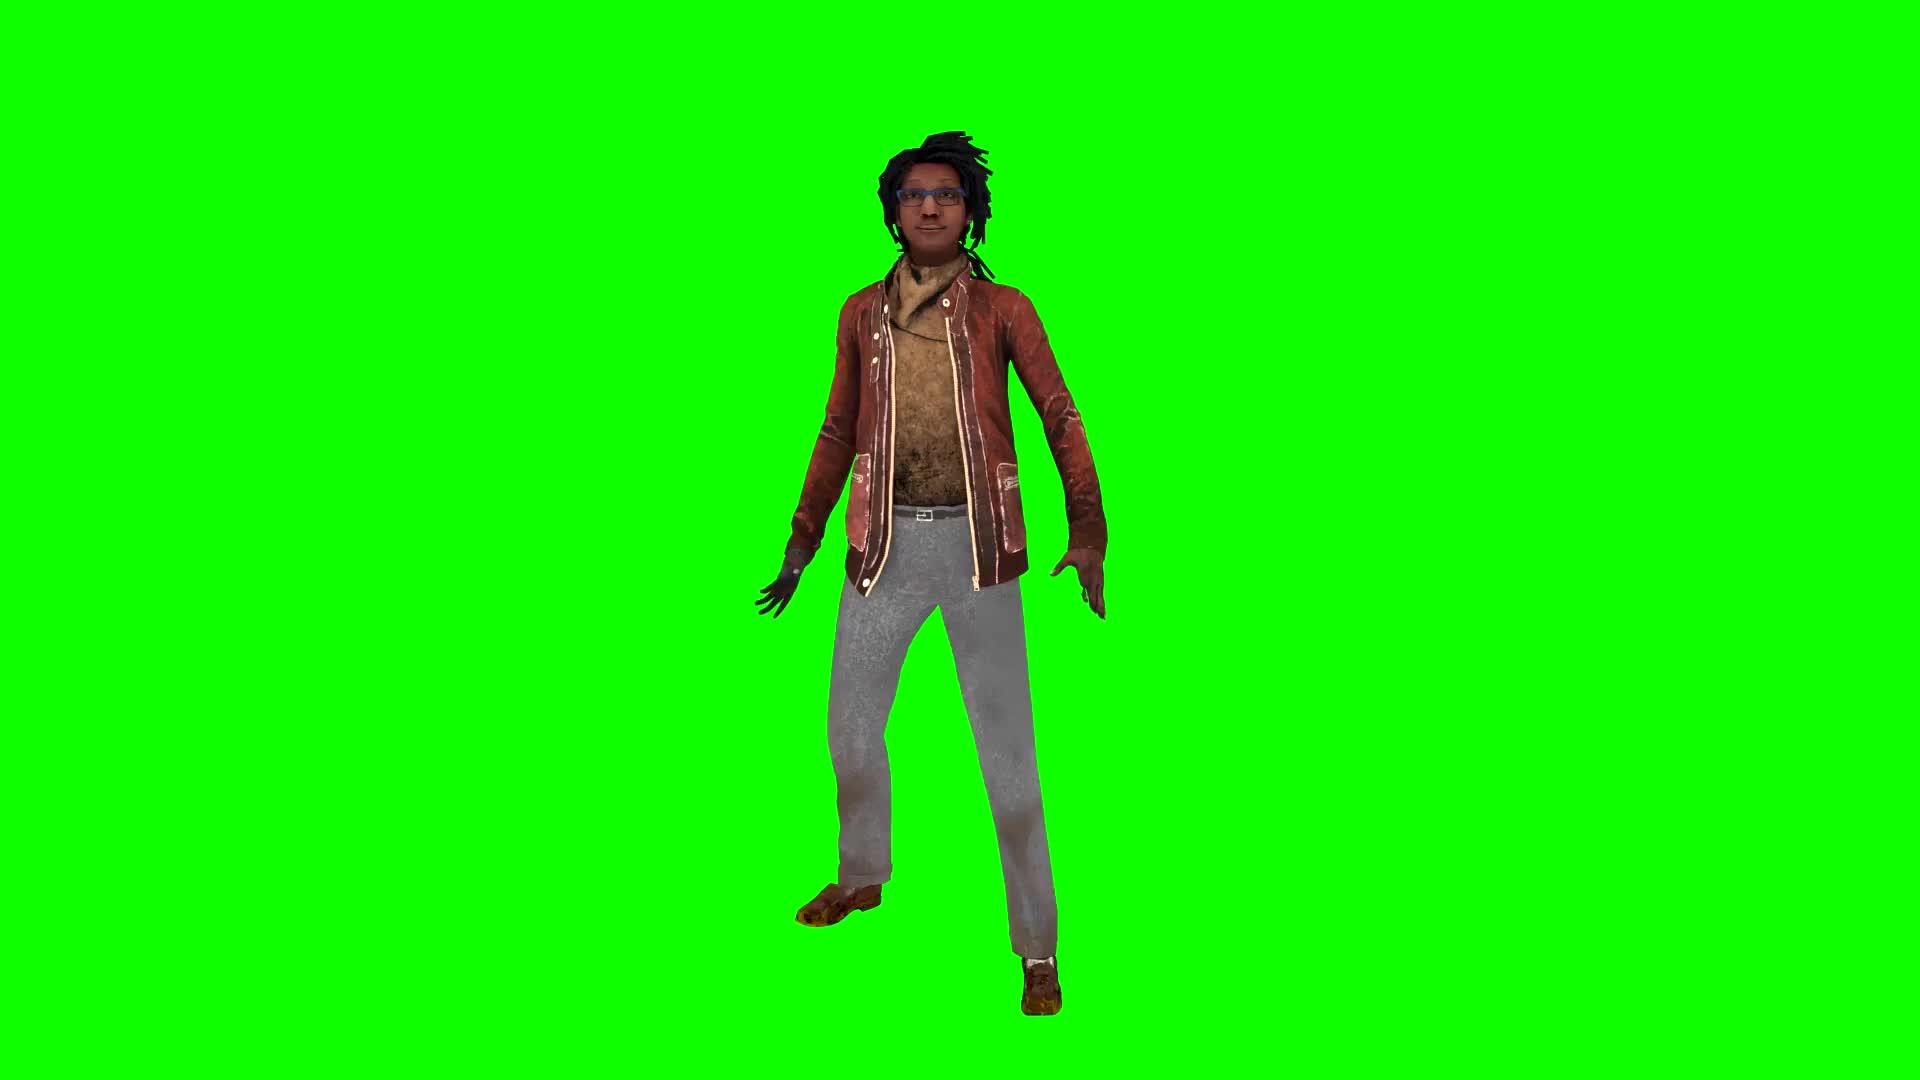 DBD Claudette Fortnite Default Dance Green Screen